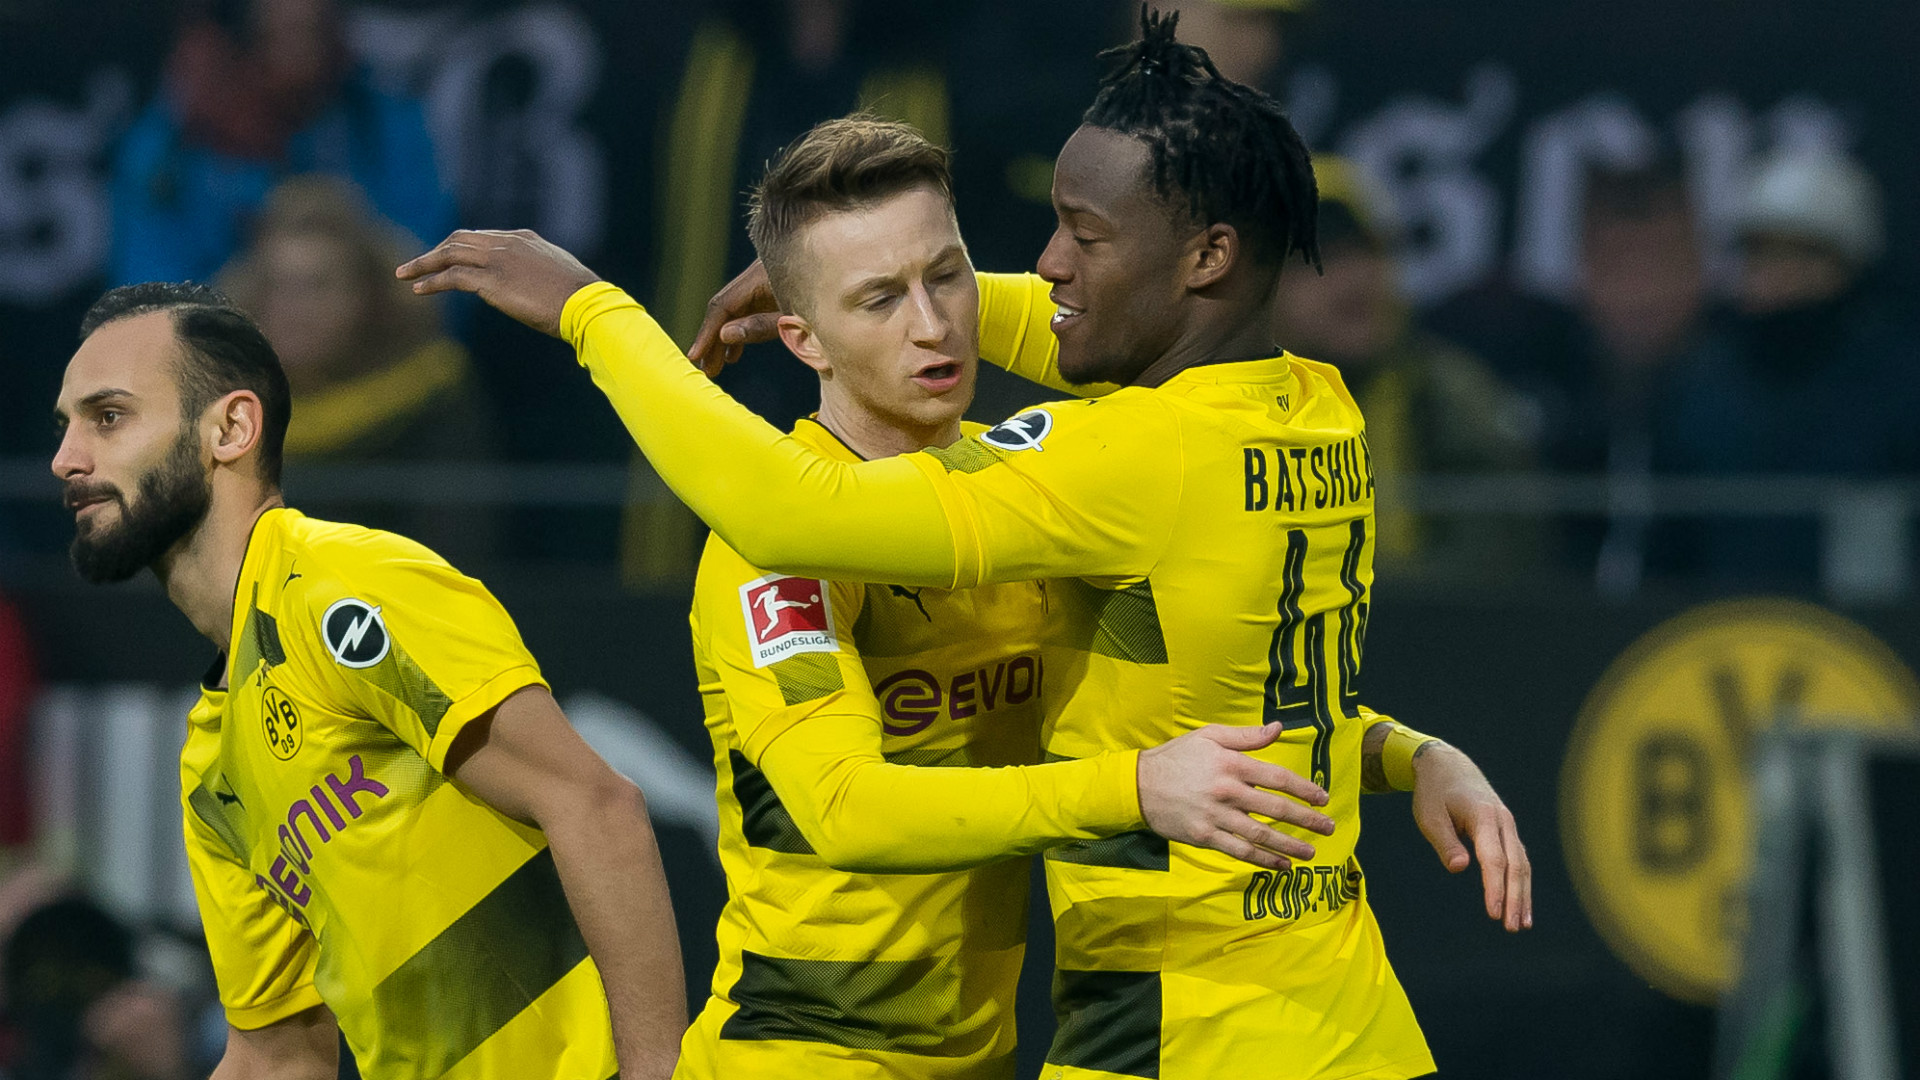 Marco Reus Michy Batshuayi Borussia Dortmund